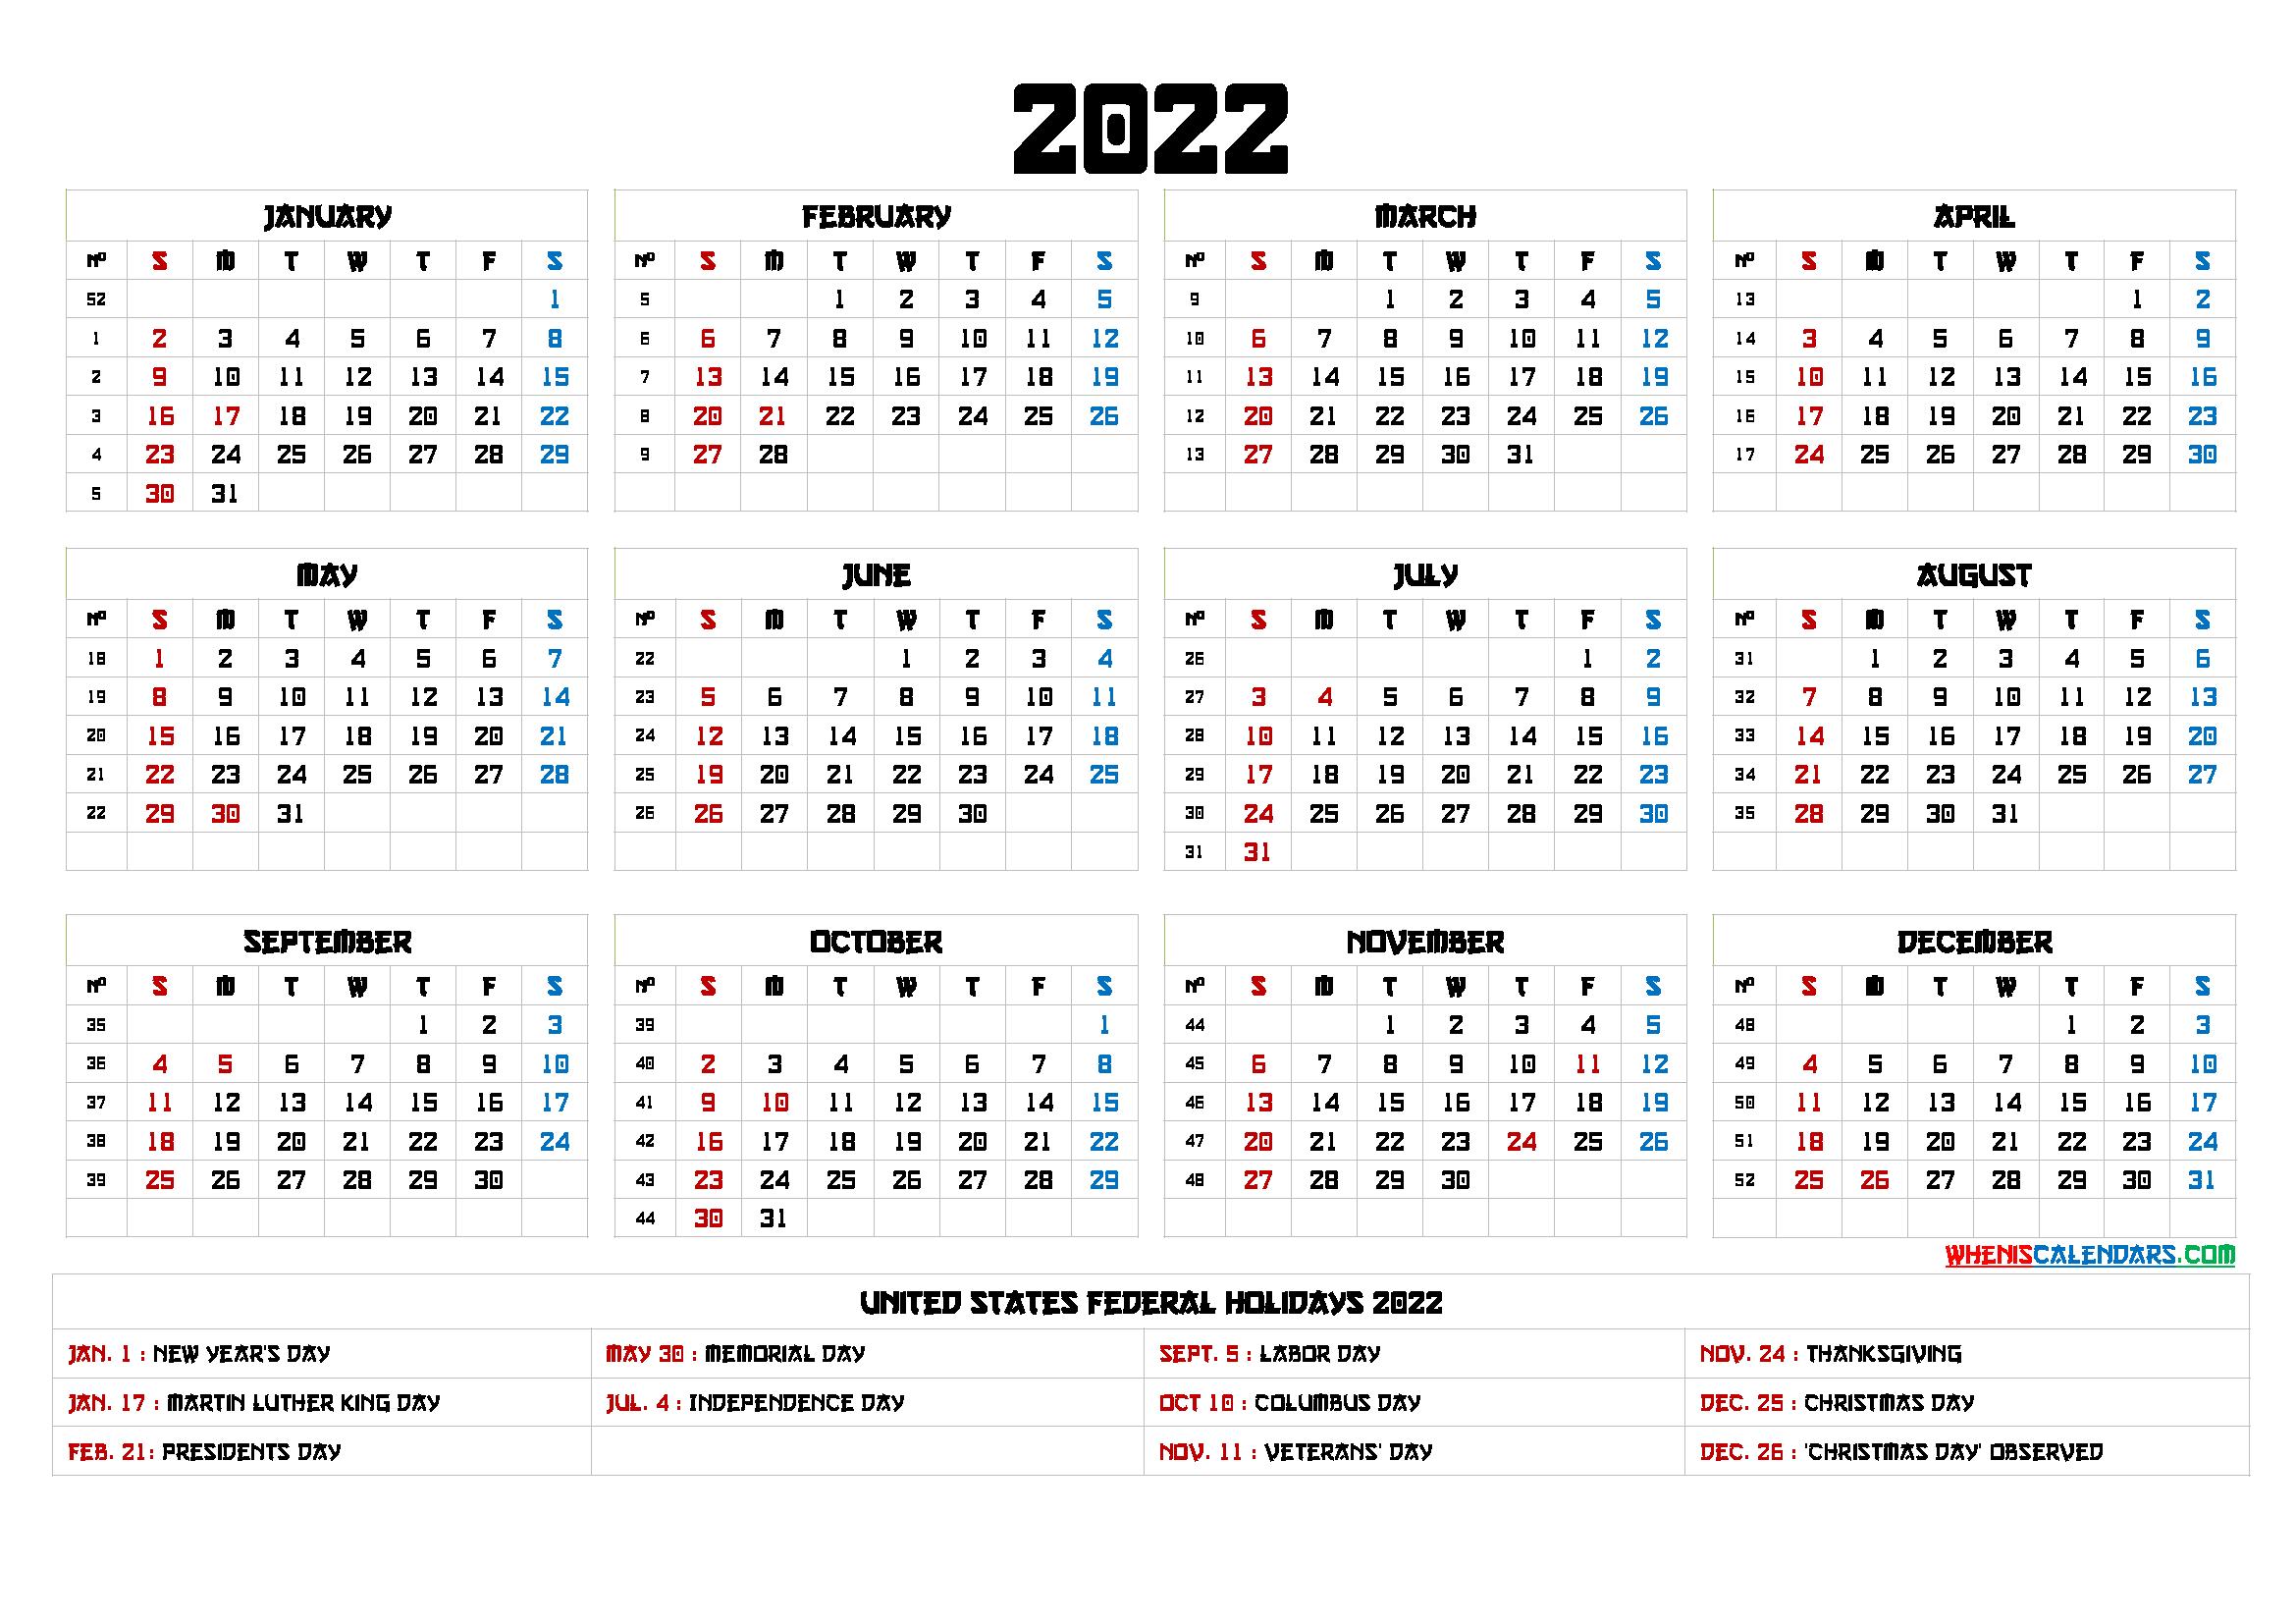 20+ 2022 Calendar - Free Download Printable Calendar intended for Printable Day Planner 2022 Image